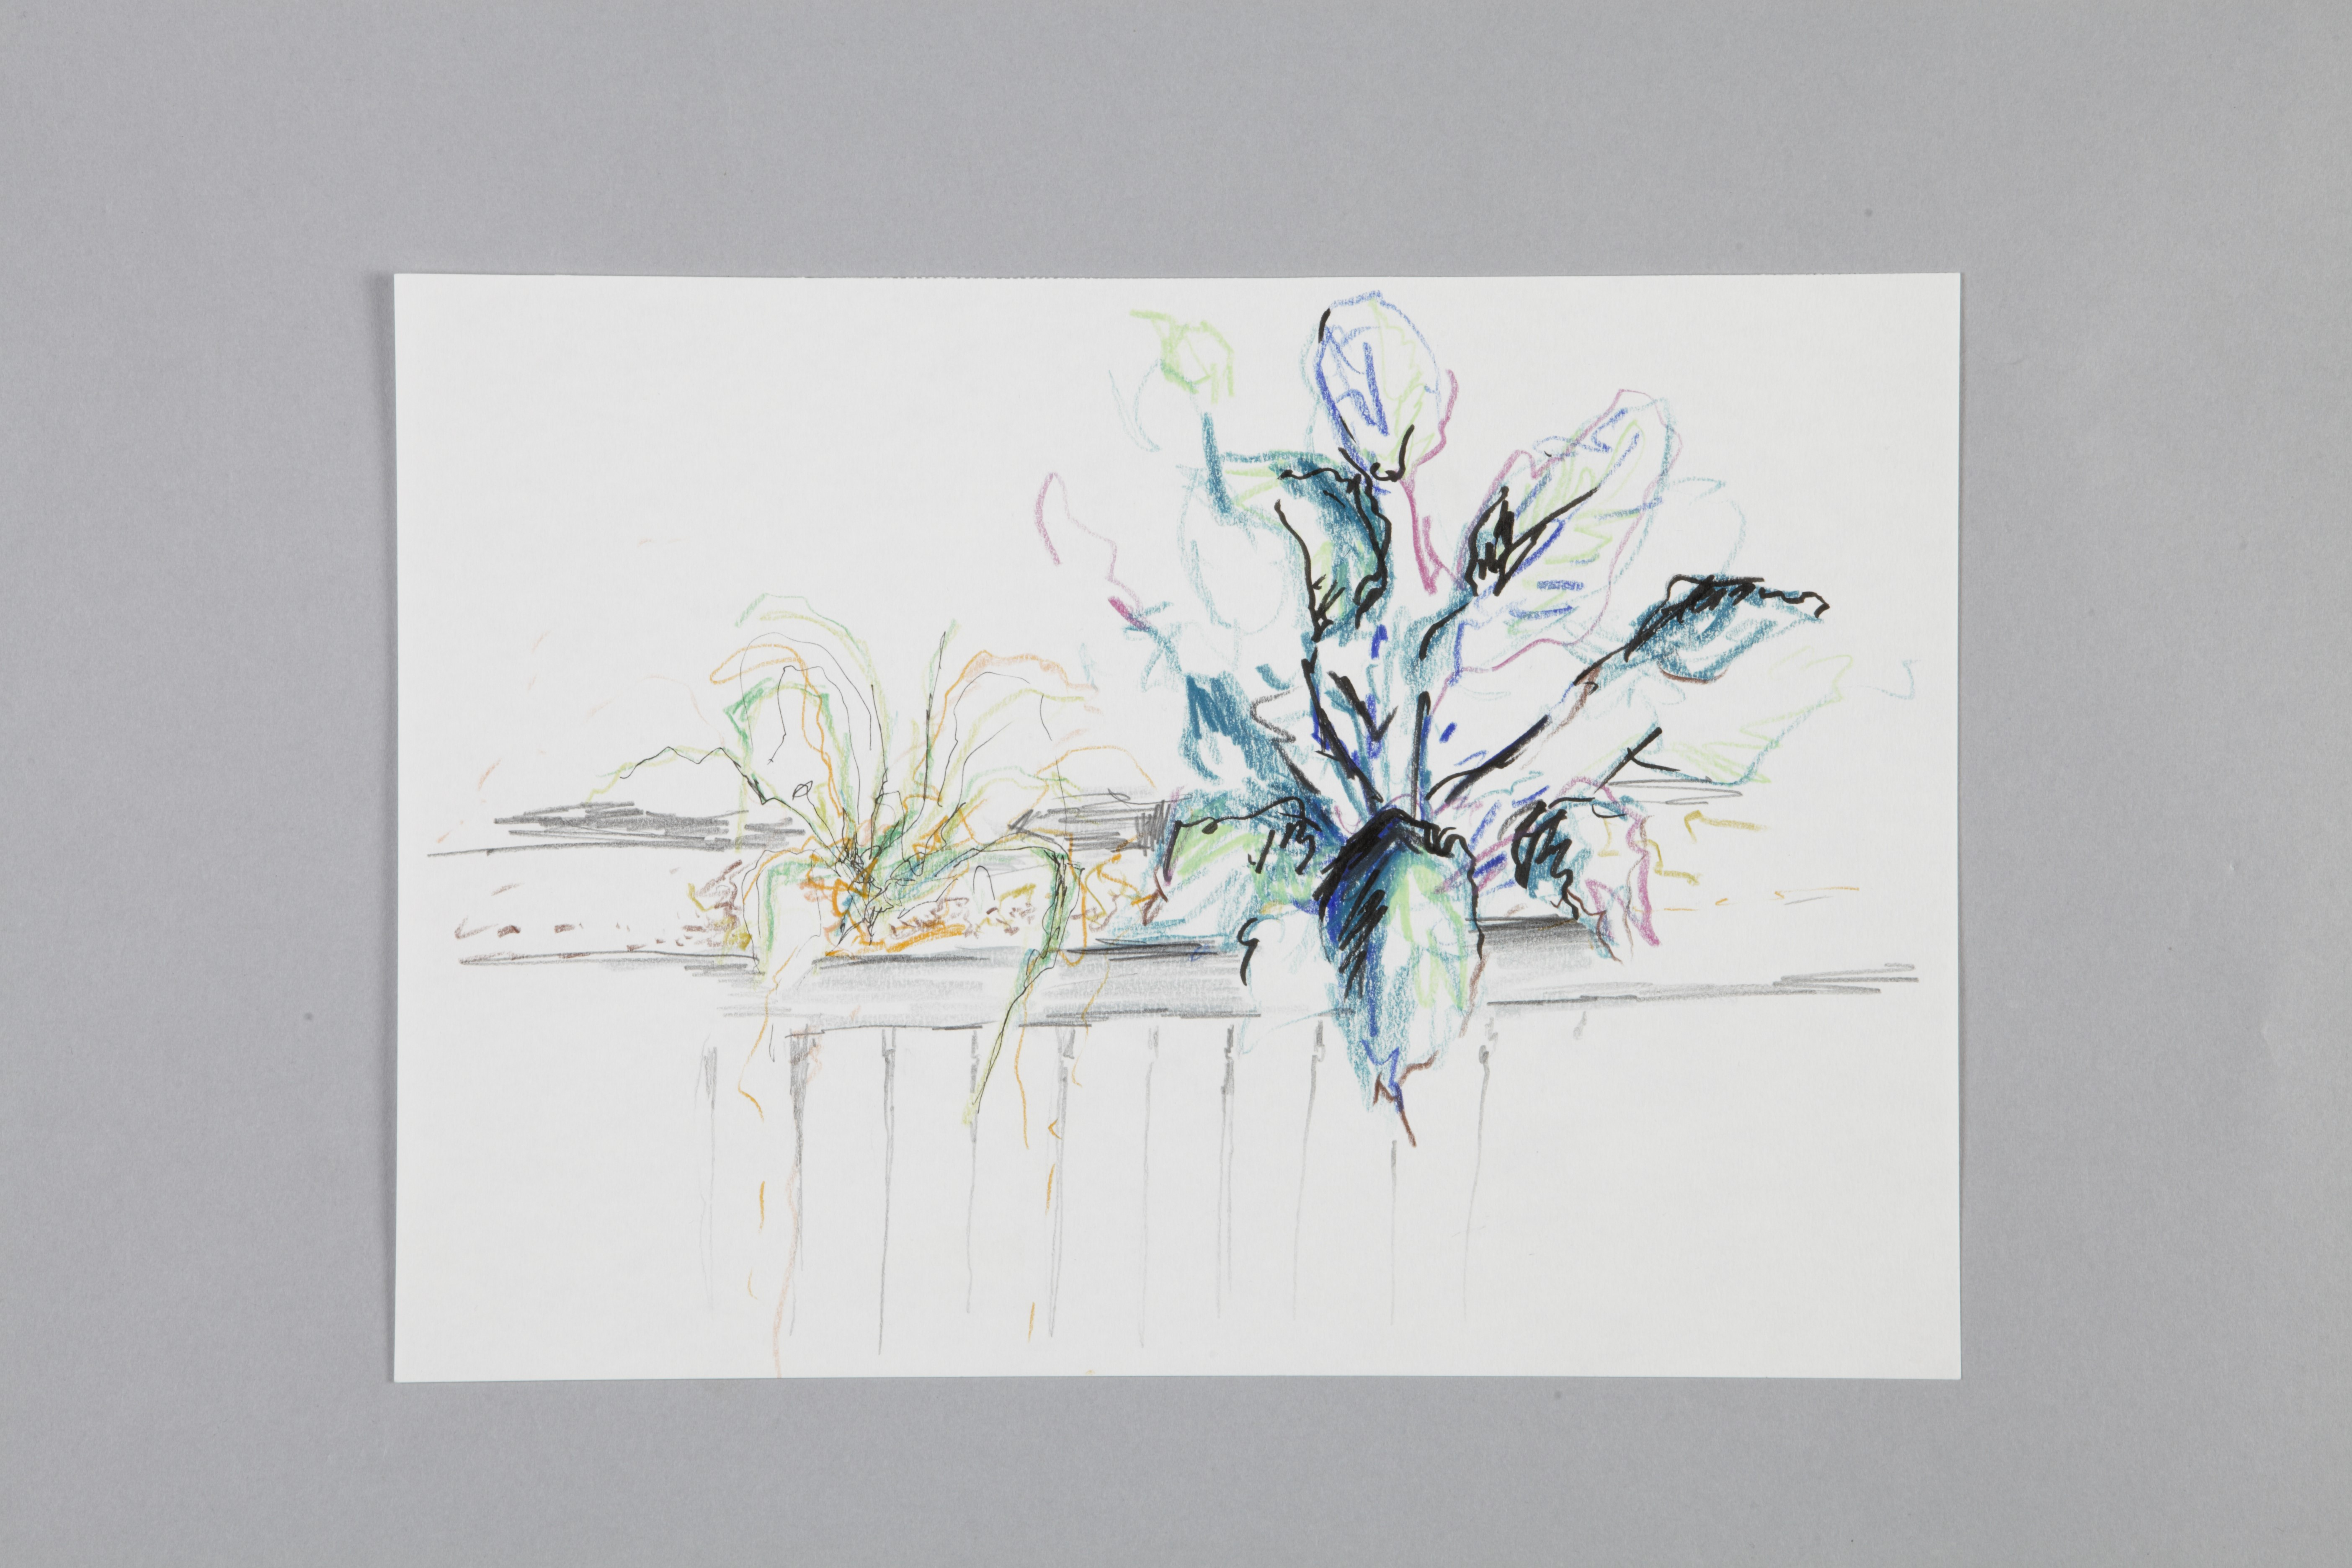 Color pencils and fineliner on paper | Kantinenpflanze I | 30×20 | 2017_Jule Sonnentag